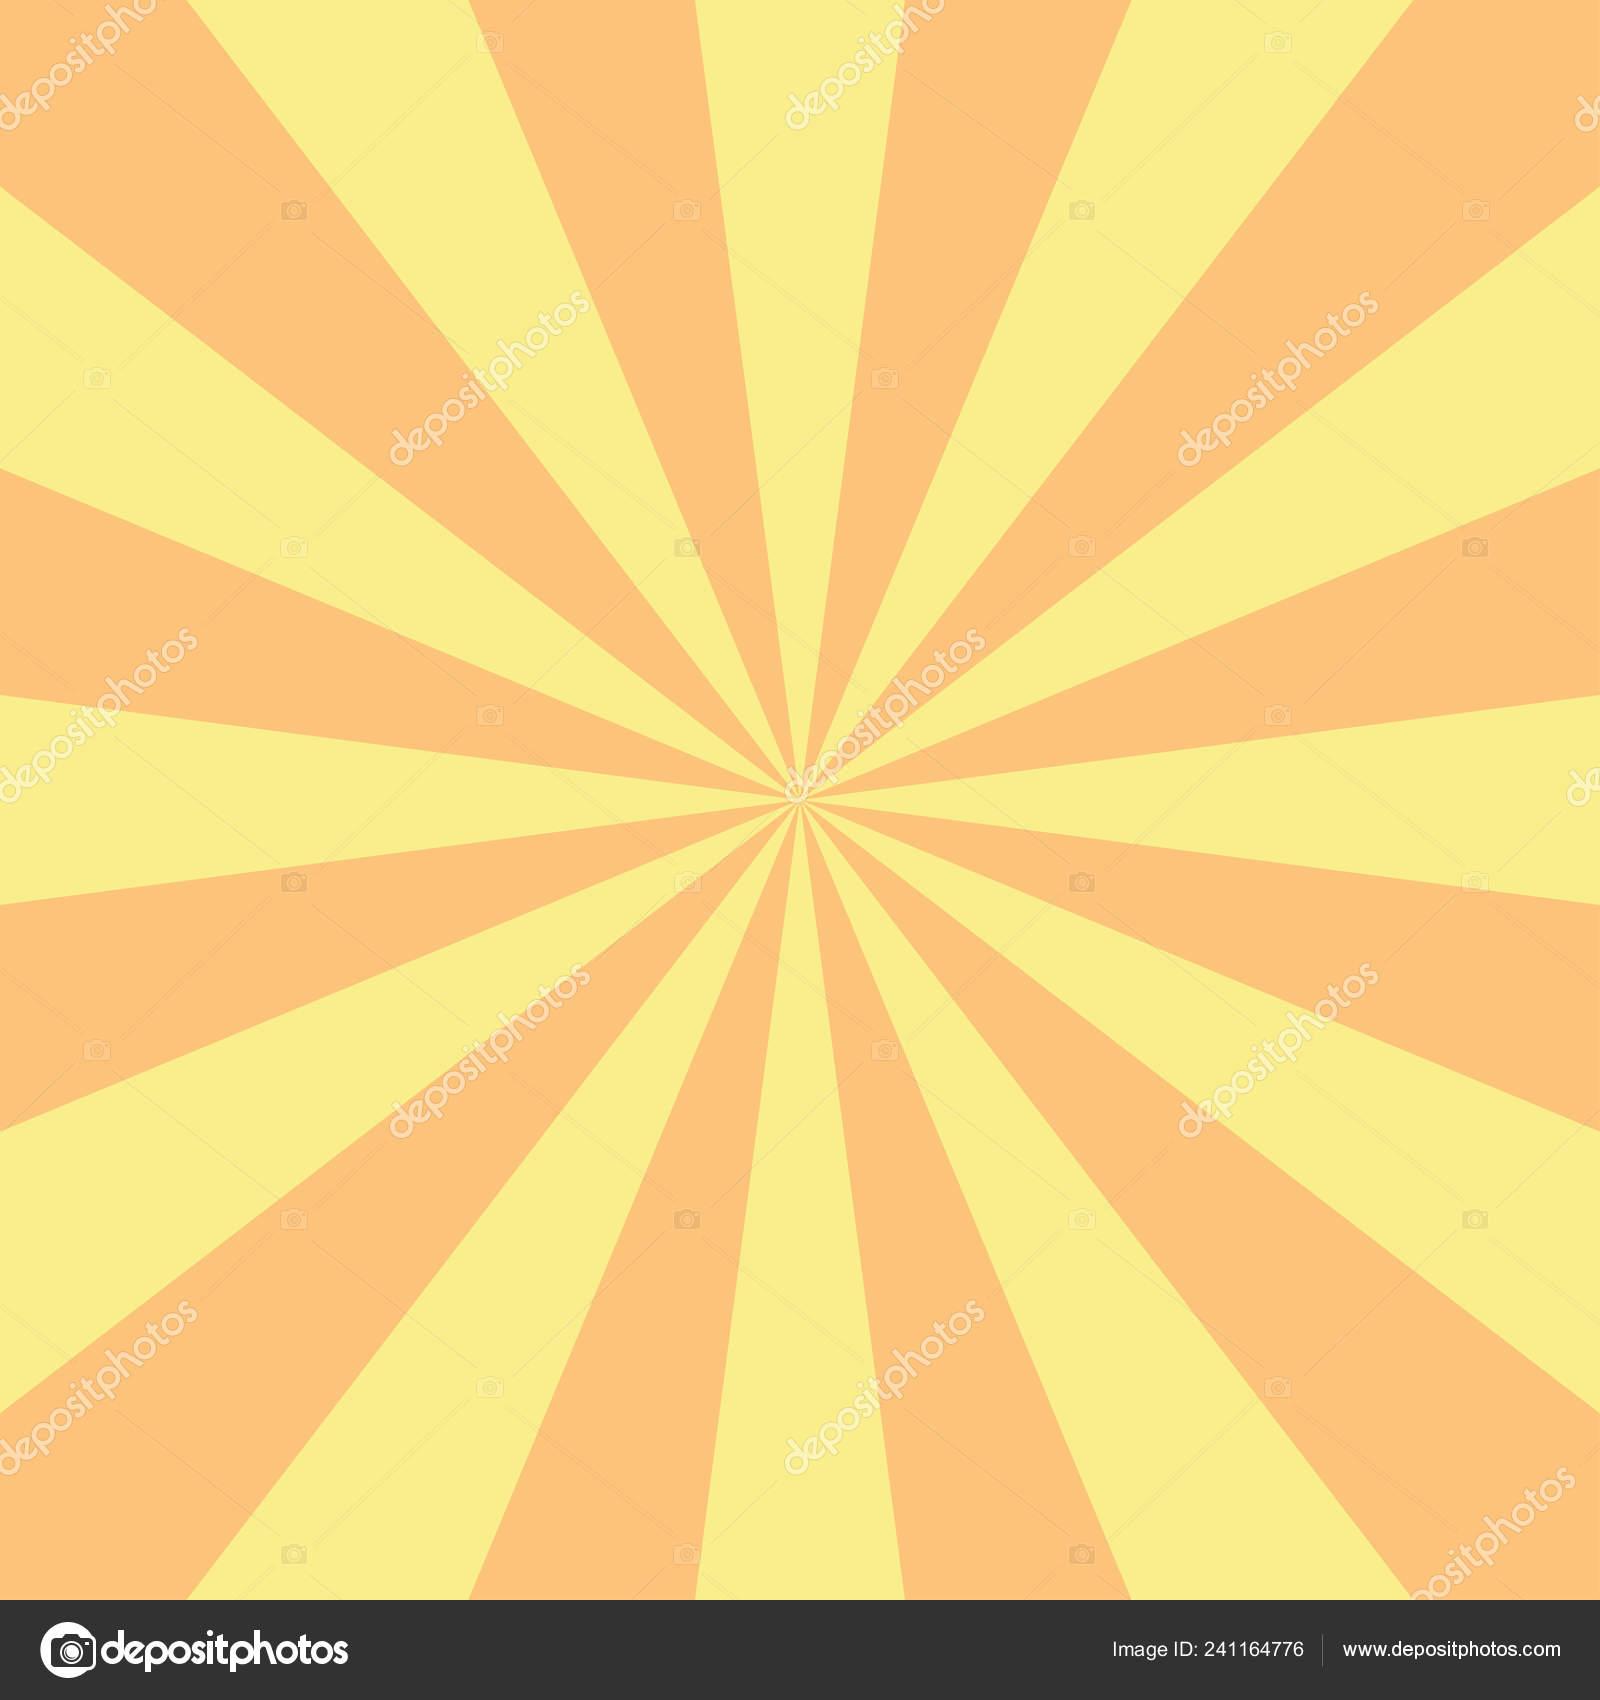 8d550f35f4ae8 Sunlight background. Yellow and orange color burst background. Fantasy  Vector illustration. Magic Sun beam ray sunburst pattern background.